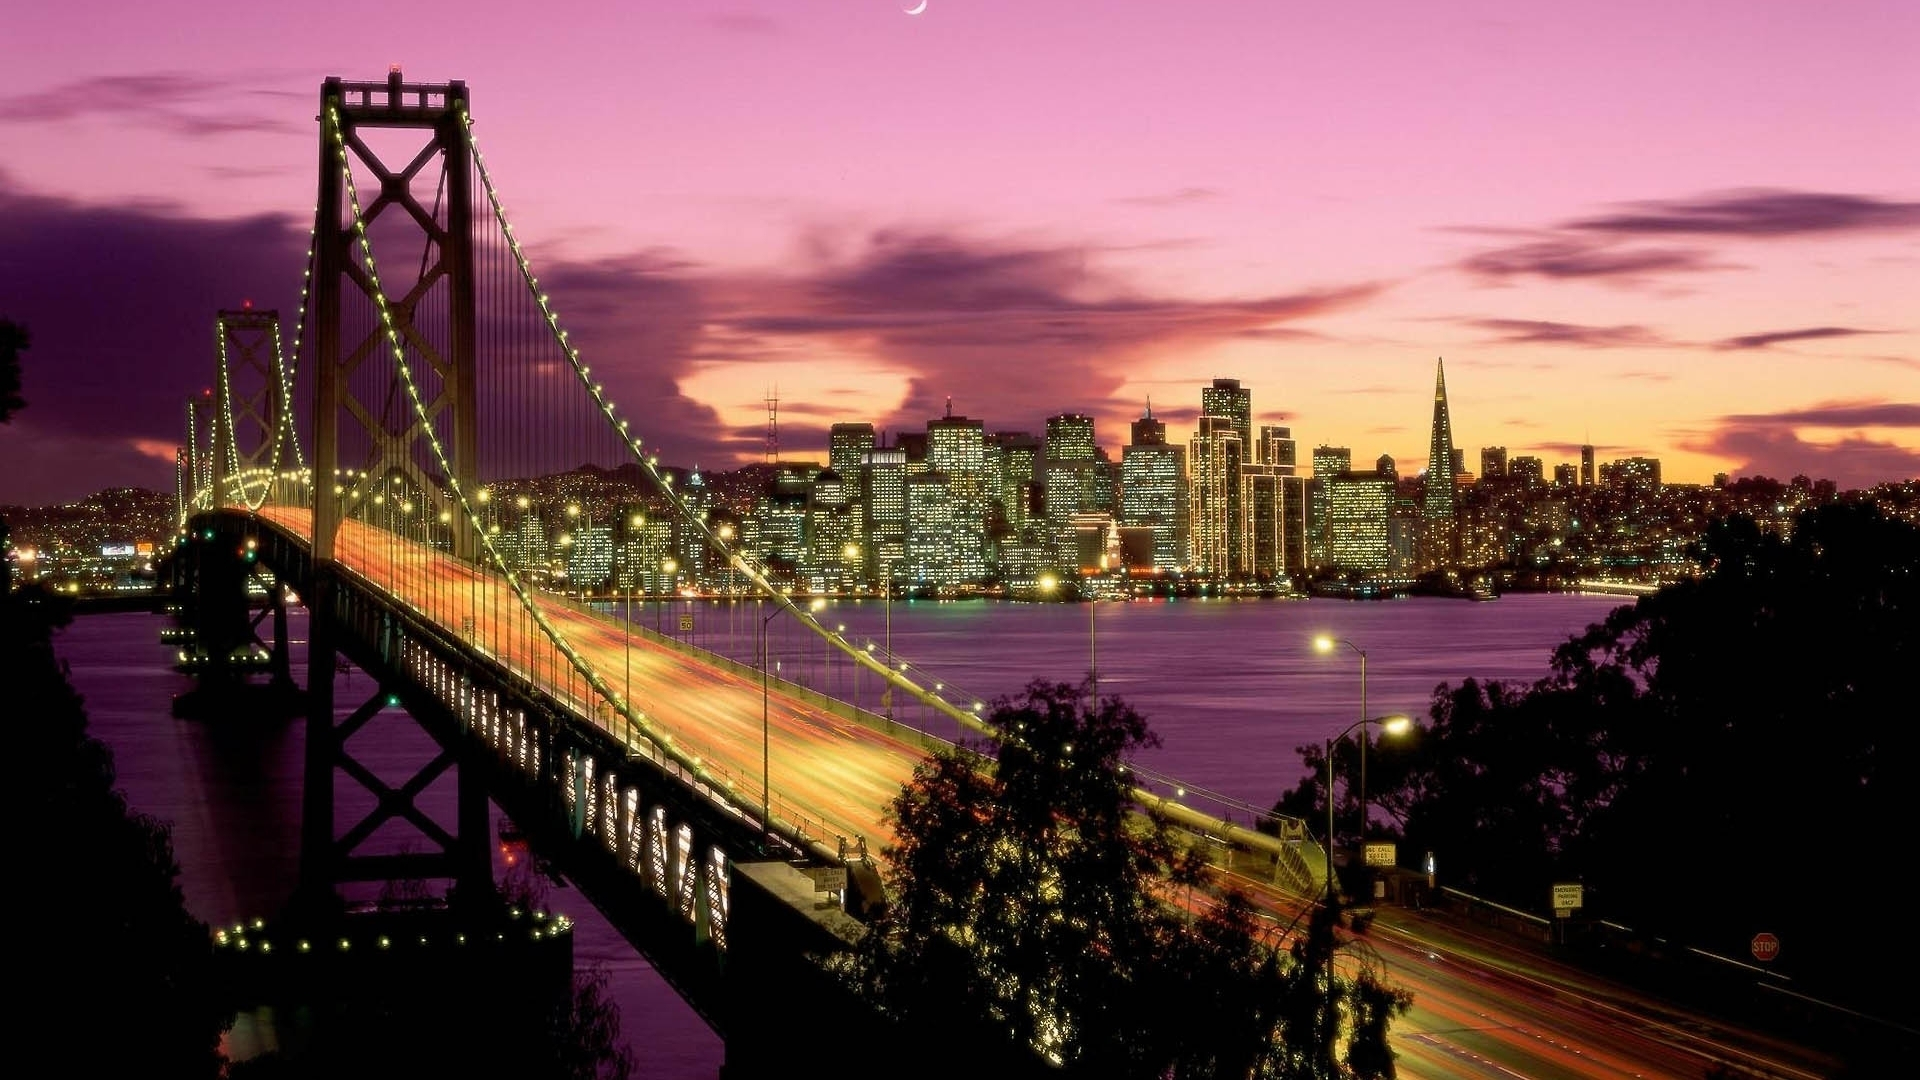 fond d'écran : san francisco, bay bridge, pont, nuit, grattes ciels